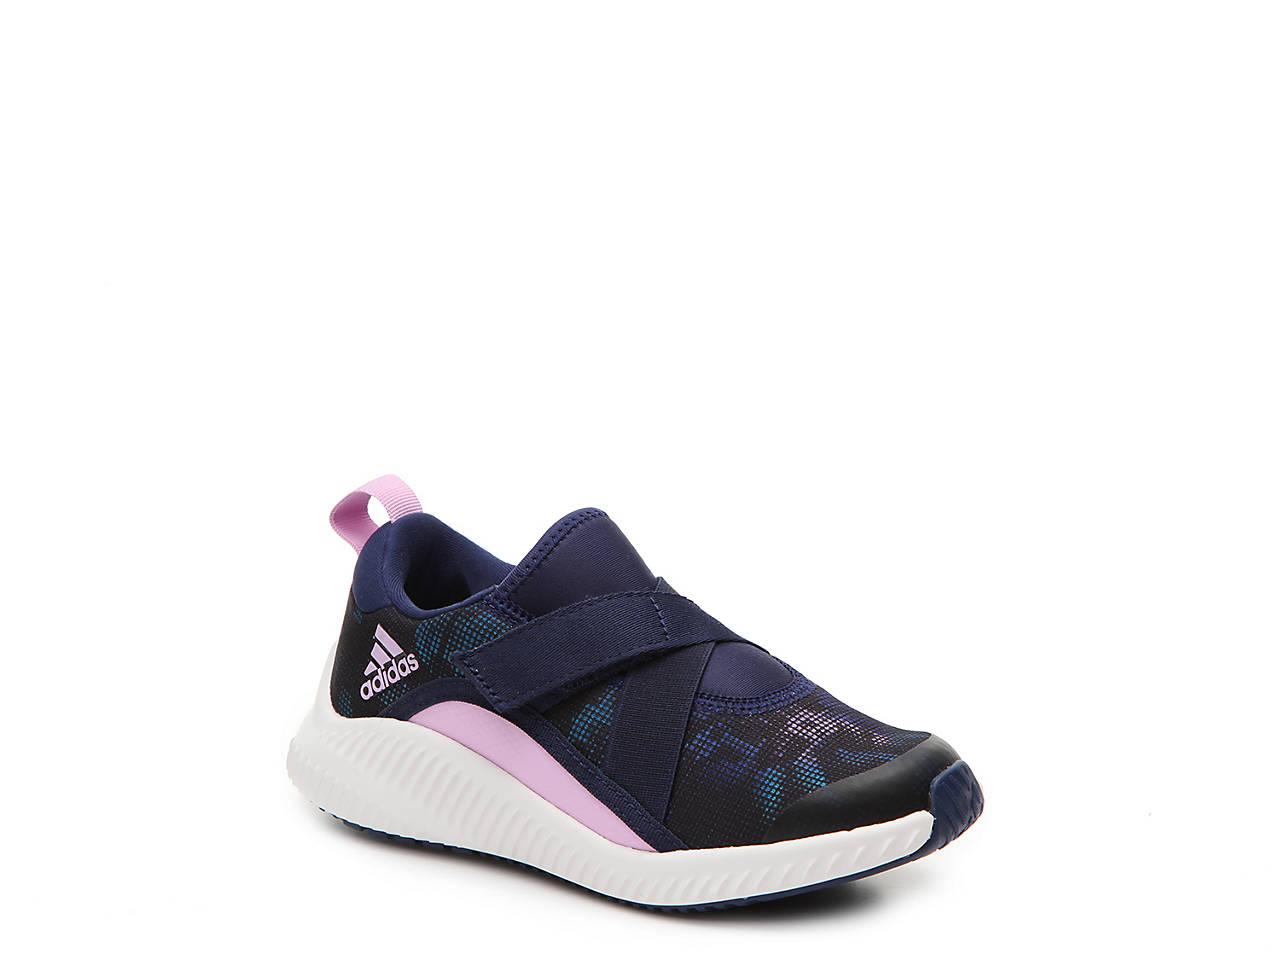 adidas Fortarun X Toddler   Youth Running Shoe Kids Shoes  0d1552365